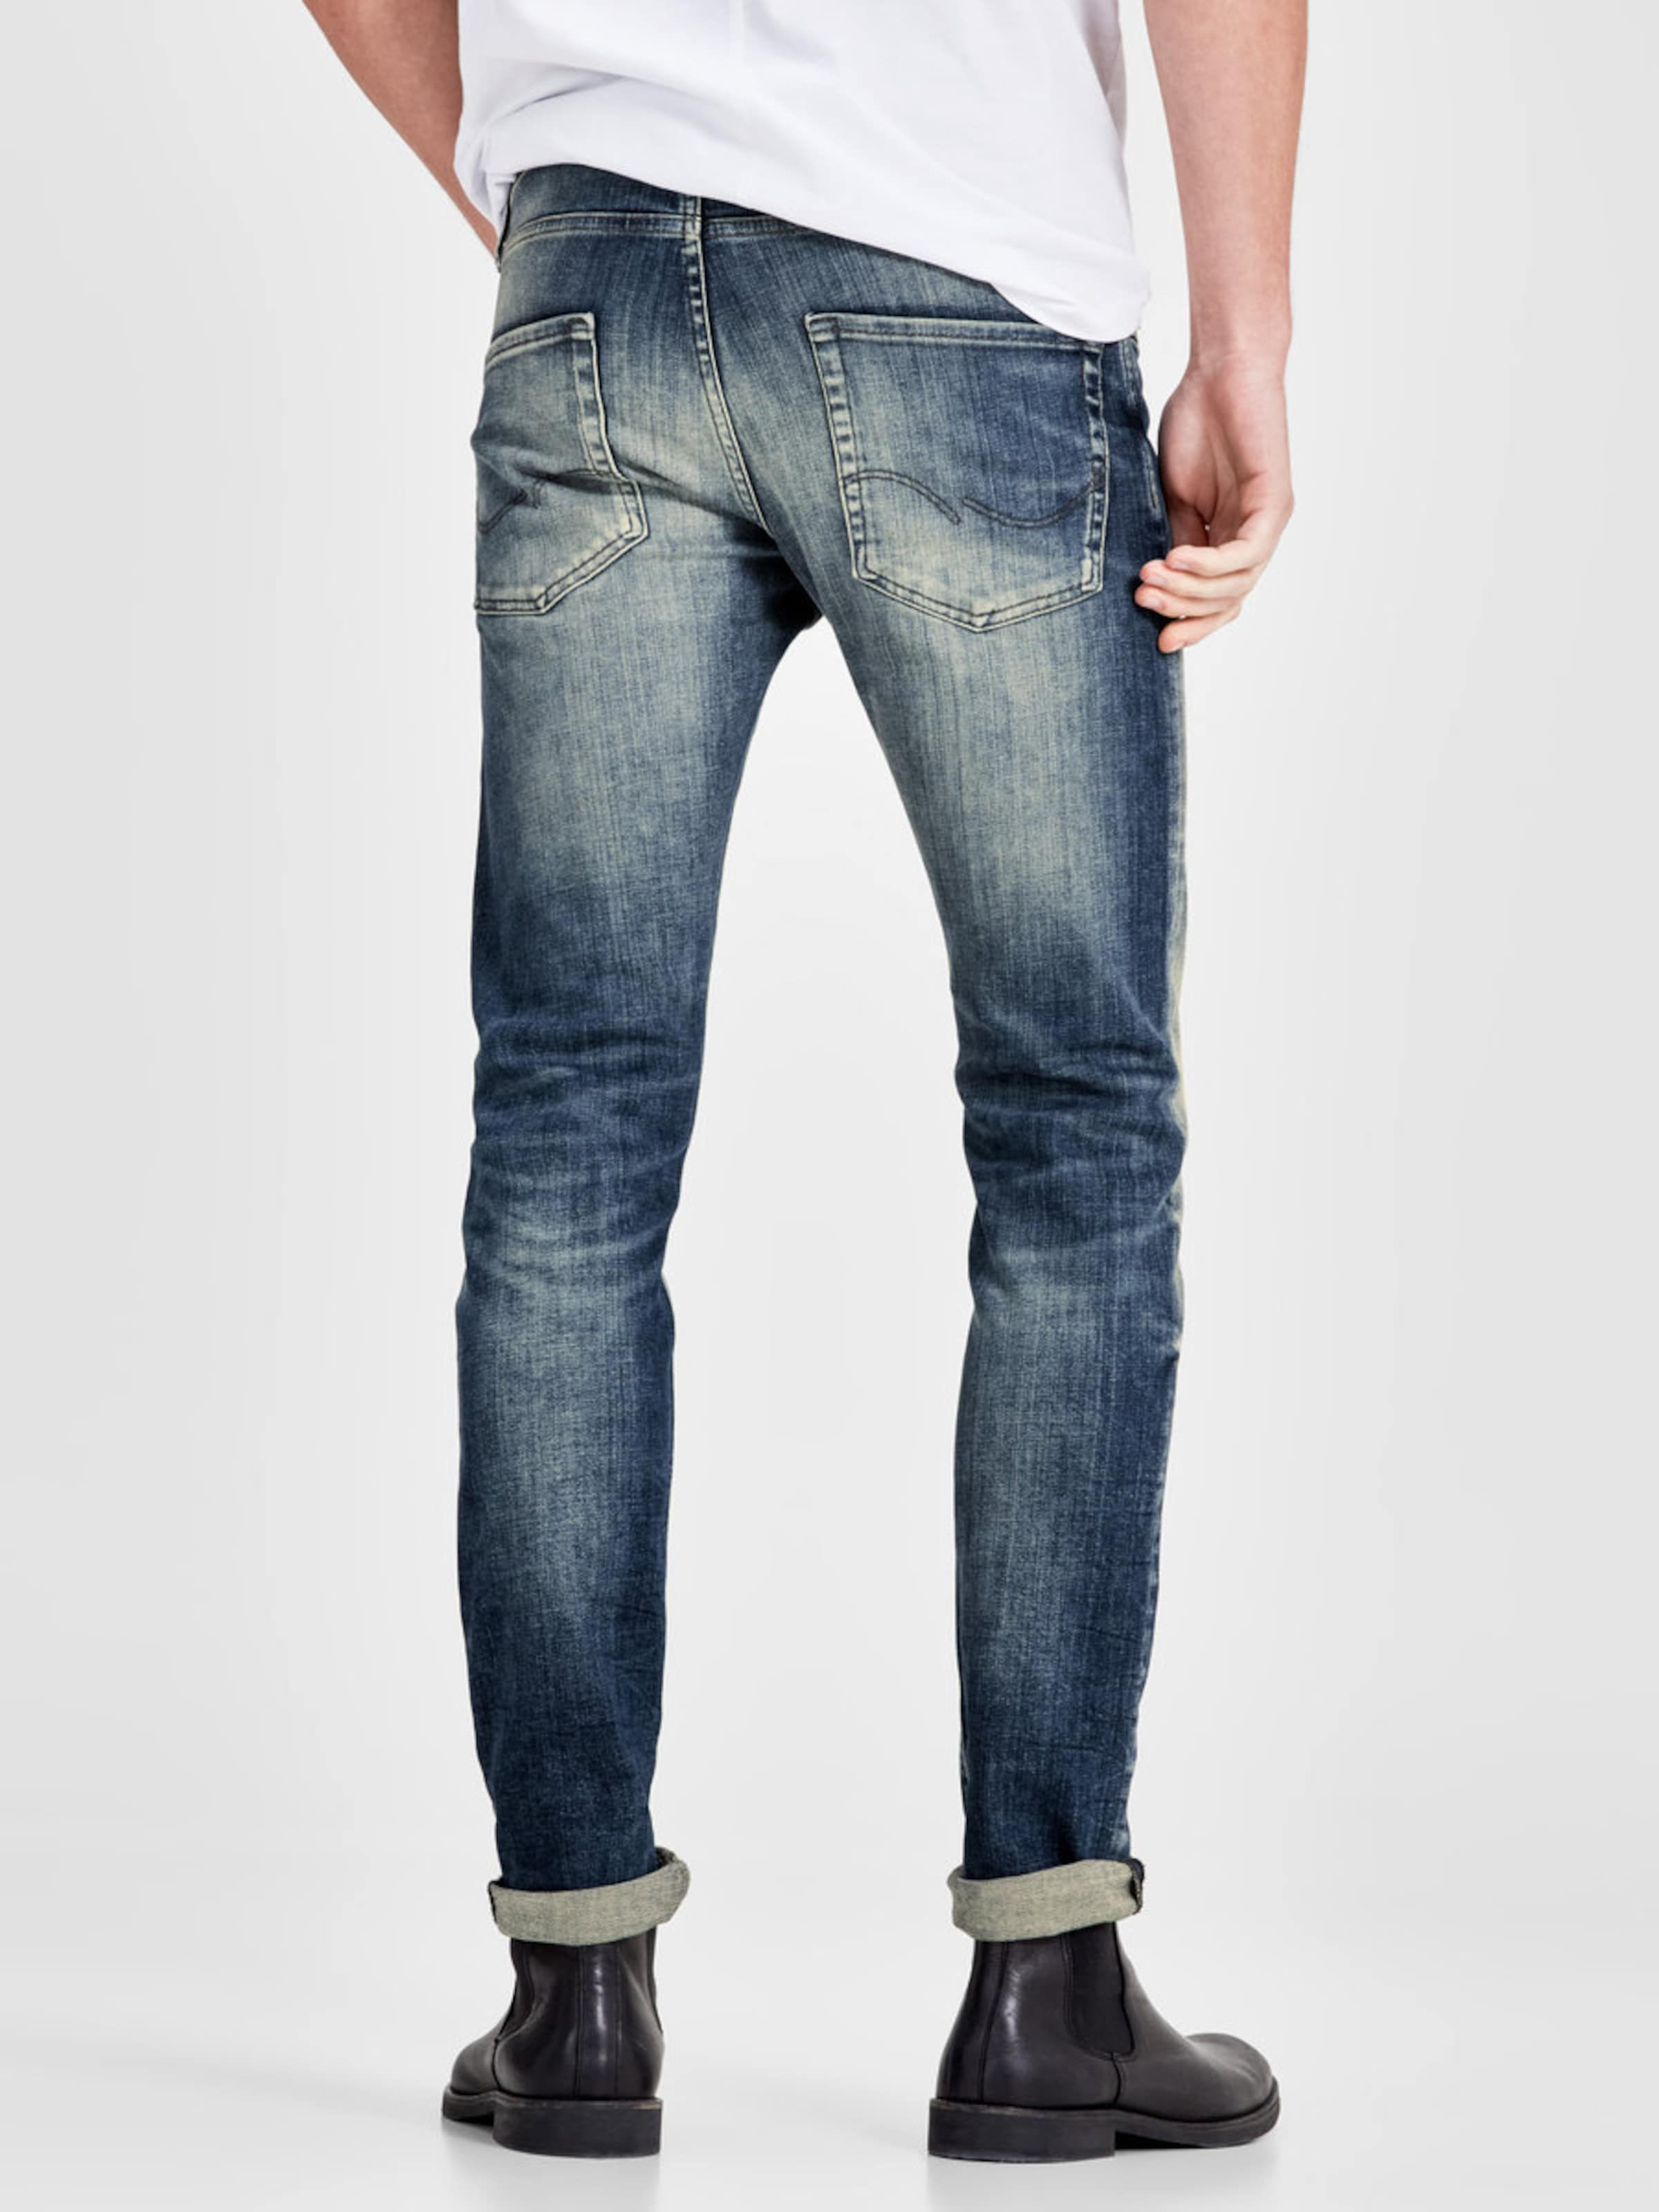 In Blau Jones Jackamp; 887' Original 'glenn Jeans c3S4ARq5jL